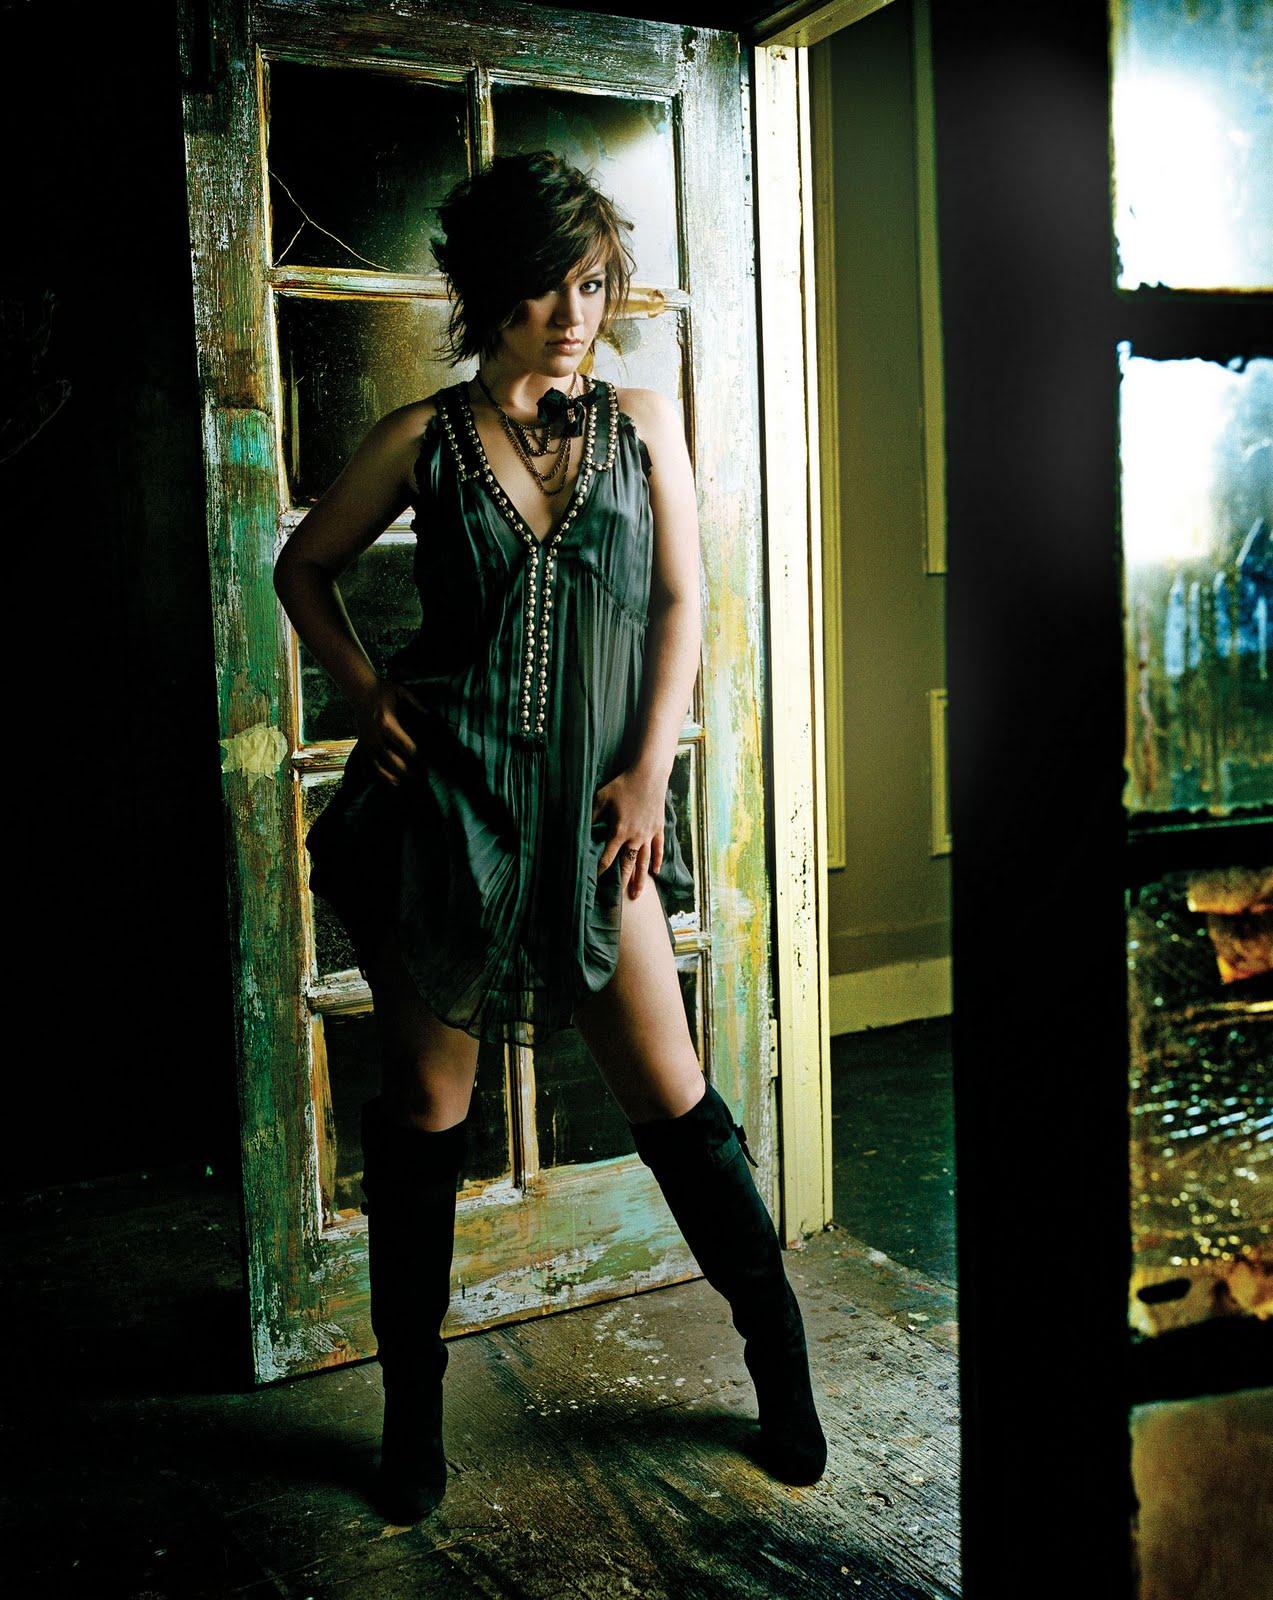 http://2.bp.blogspot.com/-gAsUw2Lf7vI/TlDgfCXkZoI/AAAAAAAAABA/qNyucq7AW38/s1600/Kelly-Clarkson-life-style-2011-american-singer-and-actress-11.jpg